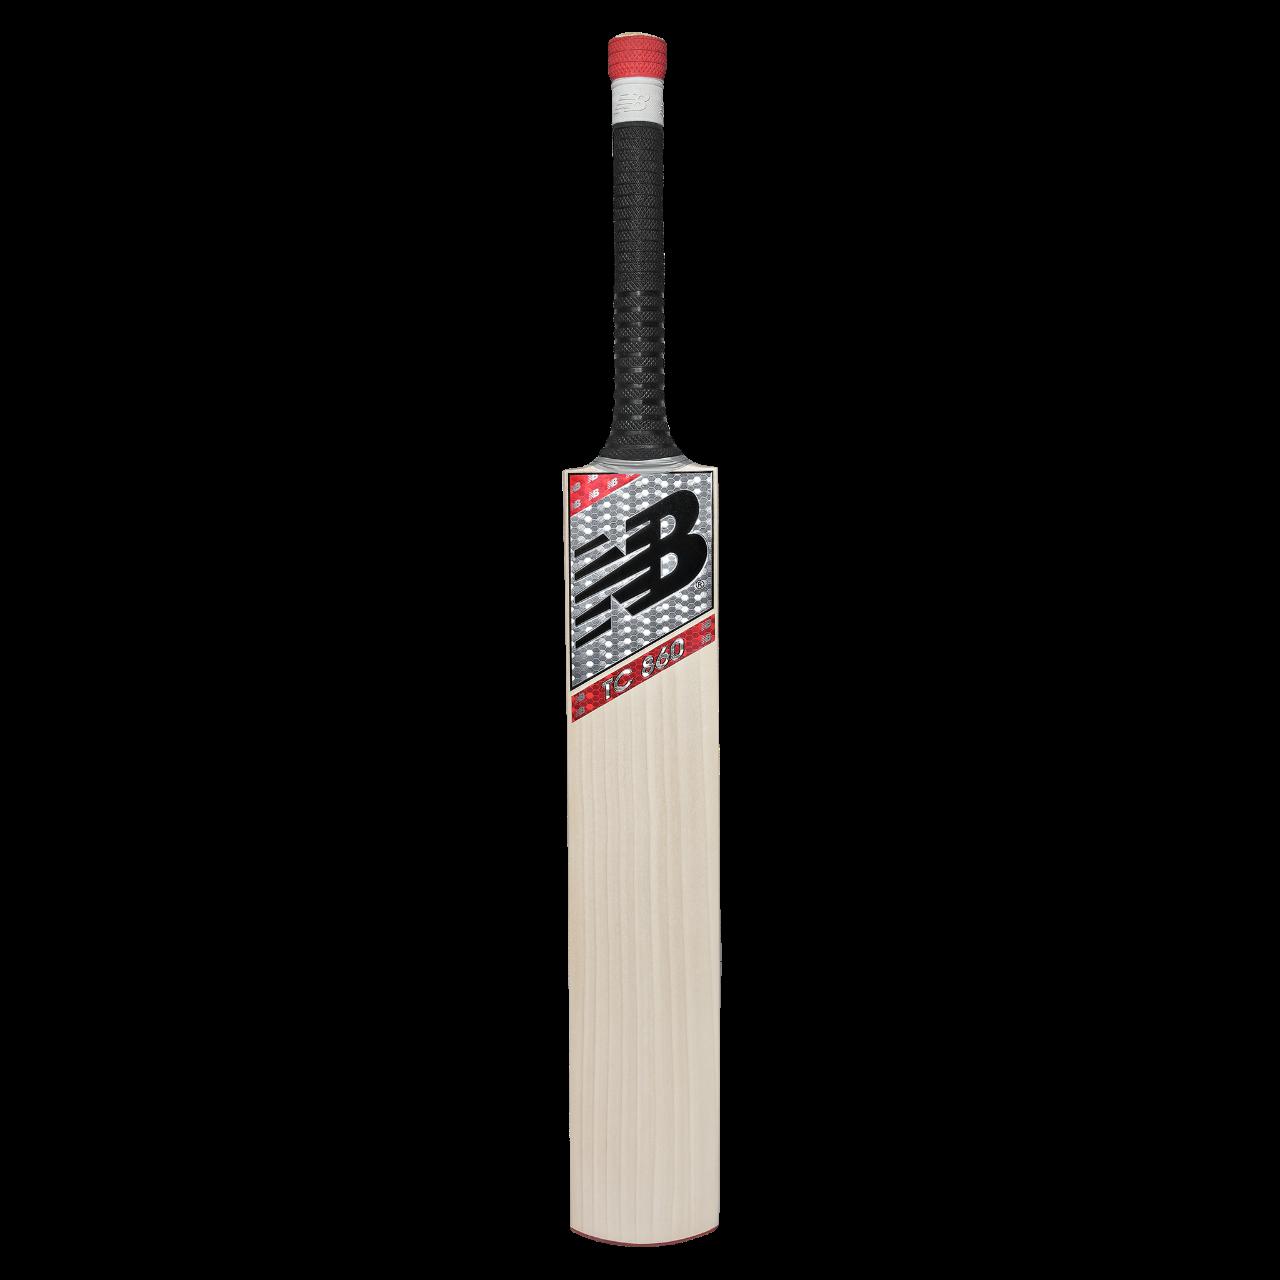 2021 New Balance TC 860 Cricket Bat